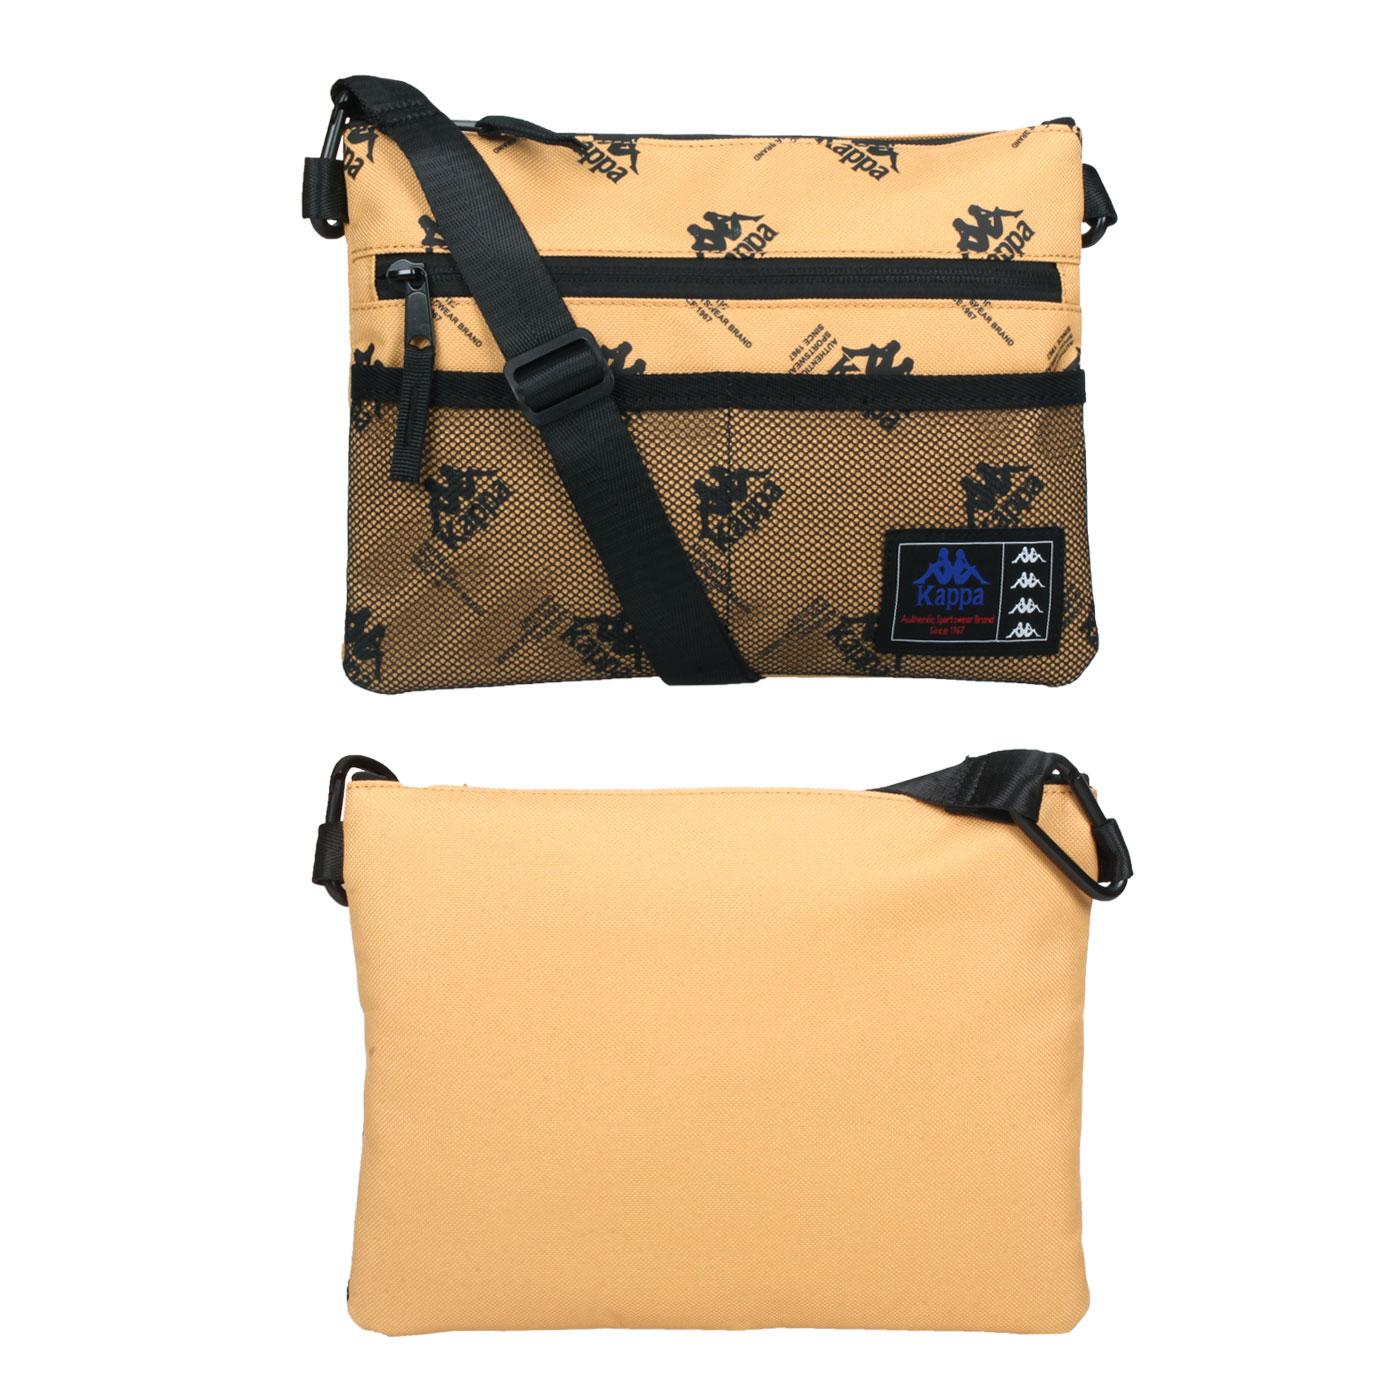 KAPPA 手拿包袋 35168KW-Z07